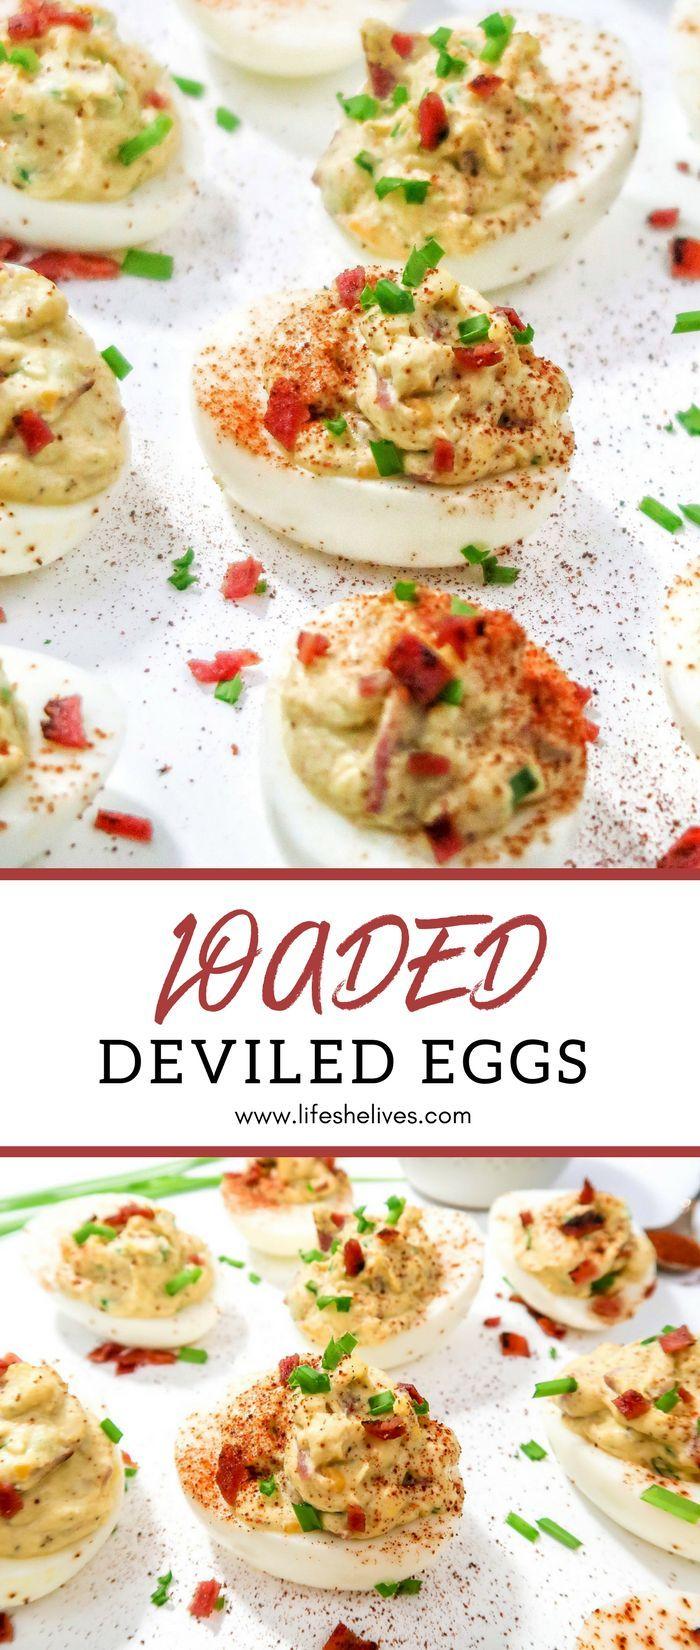 """Loaded"" Deviled Eggs"